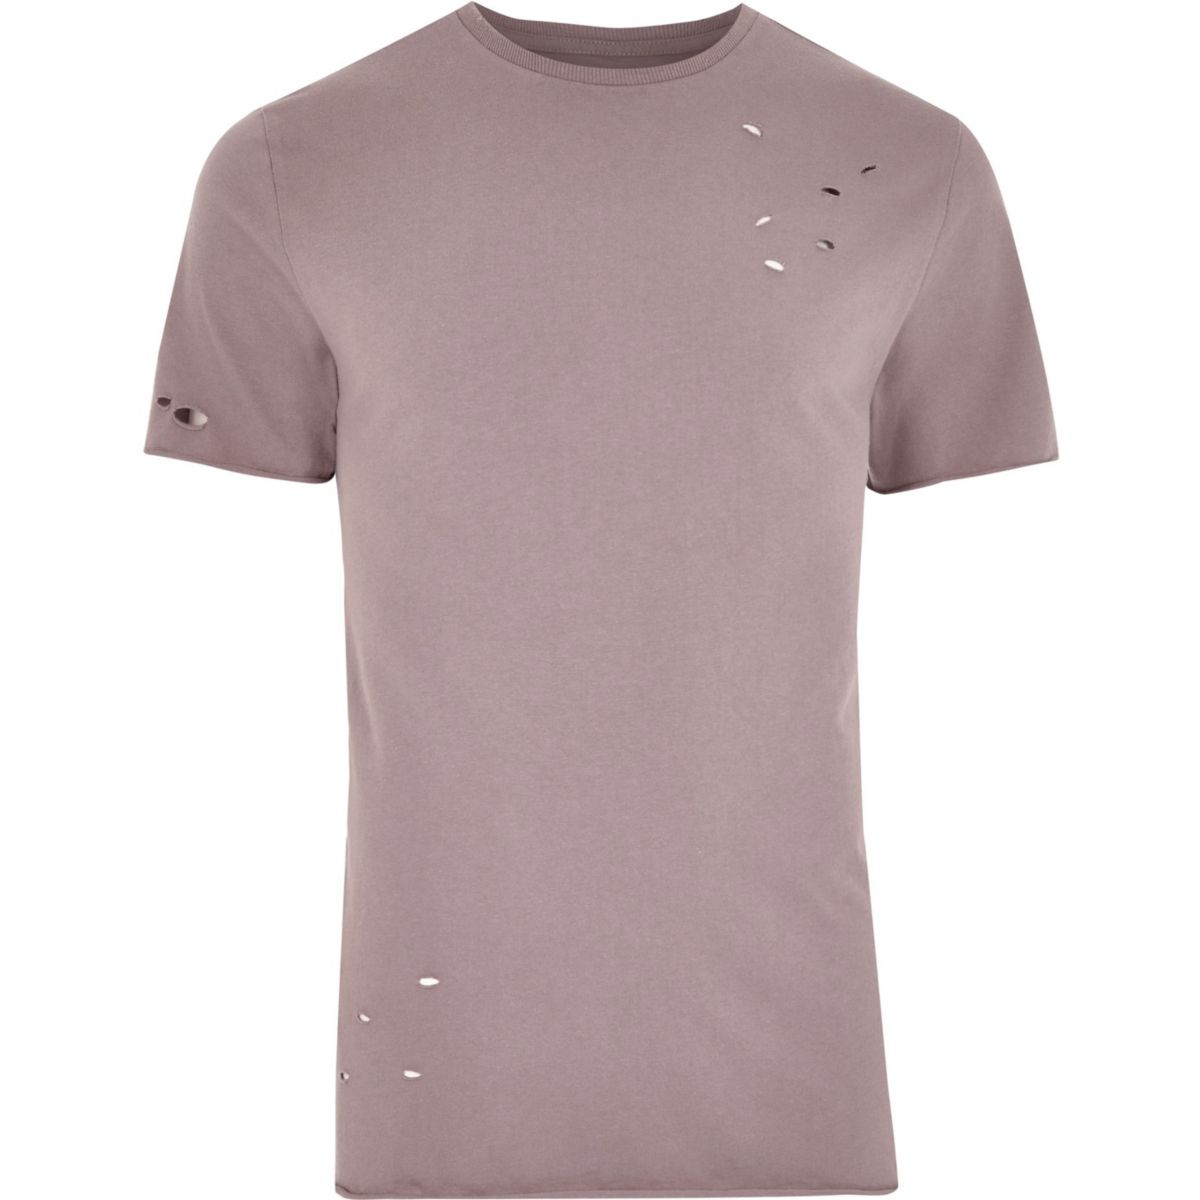 Pink distressed slim fit T-shirt